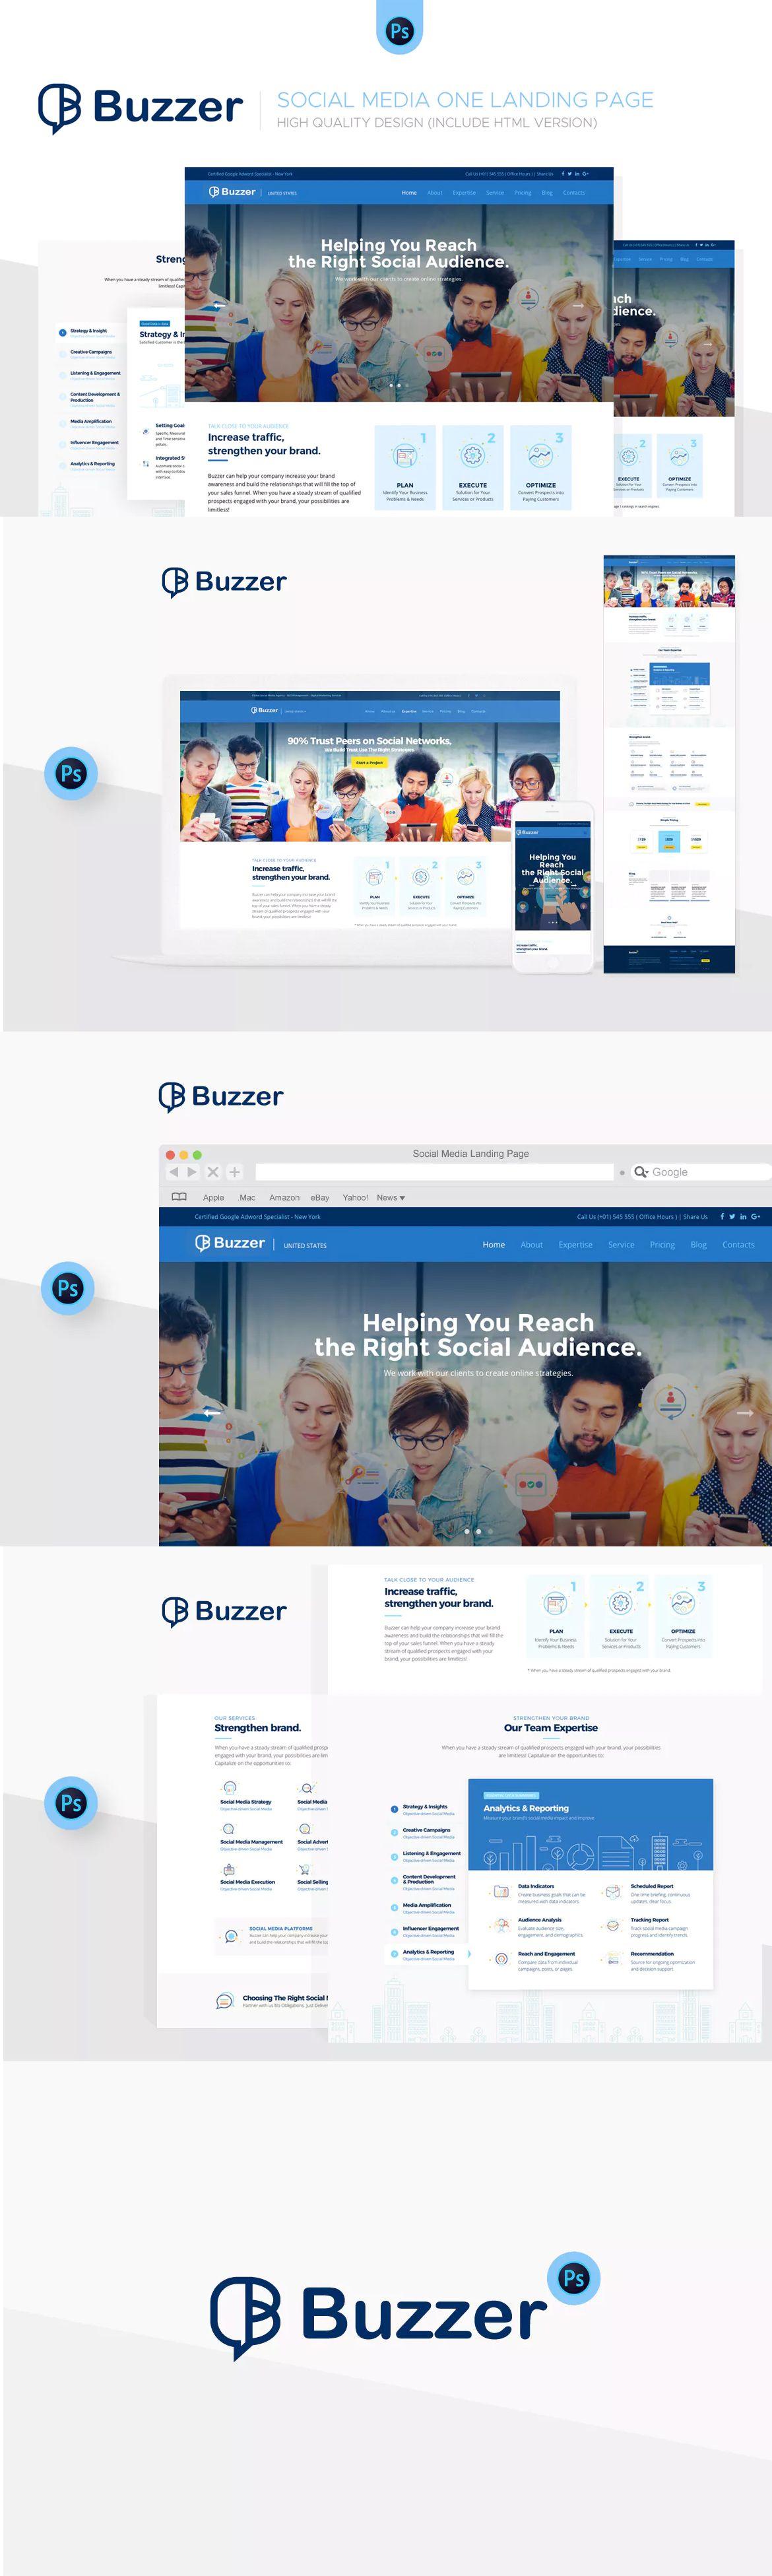 buzzer social media landing page psd html unlimiteddownloads